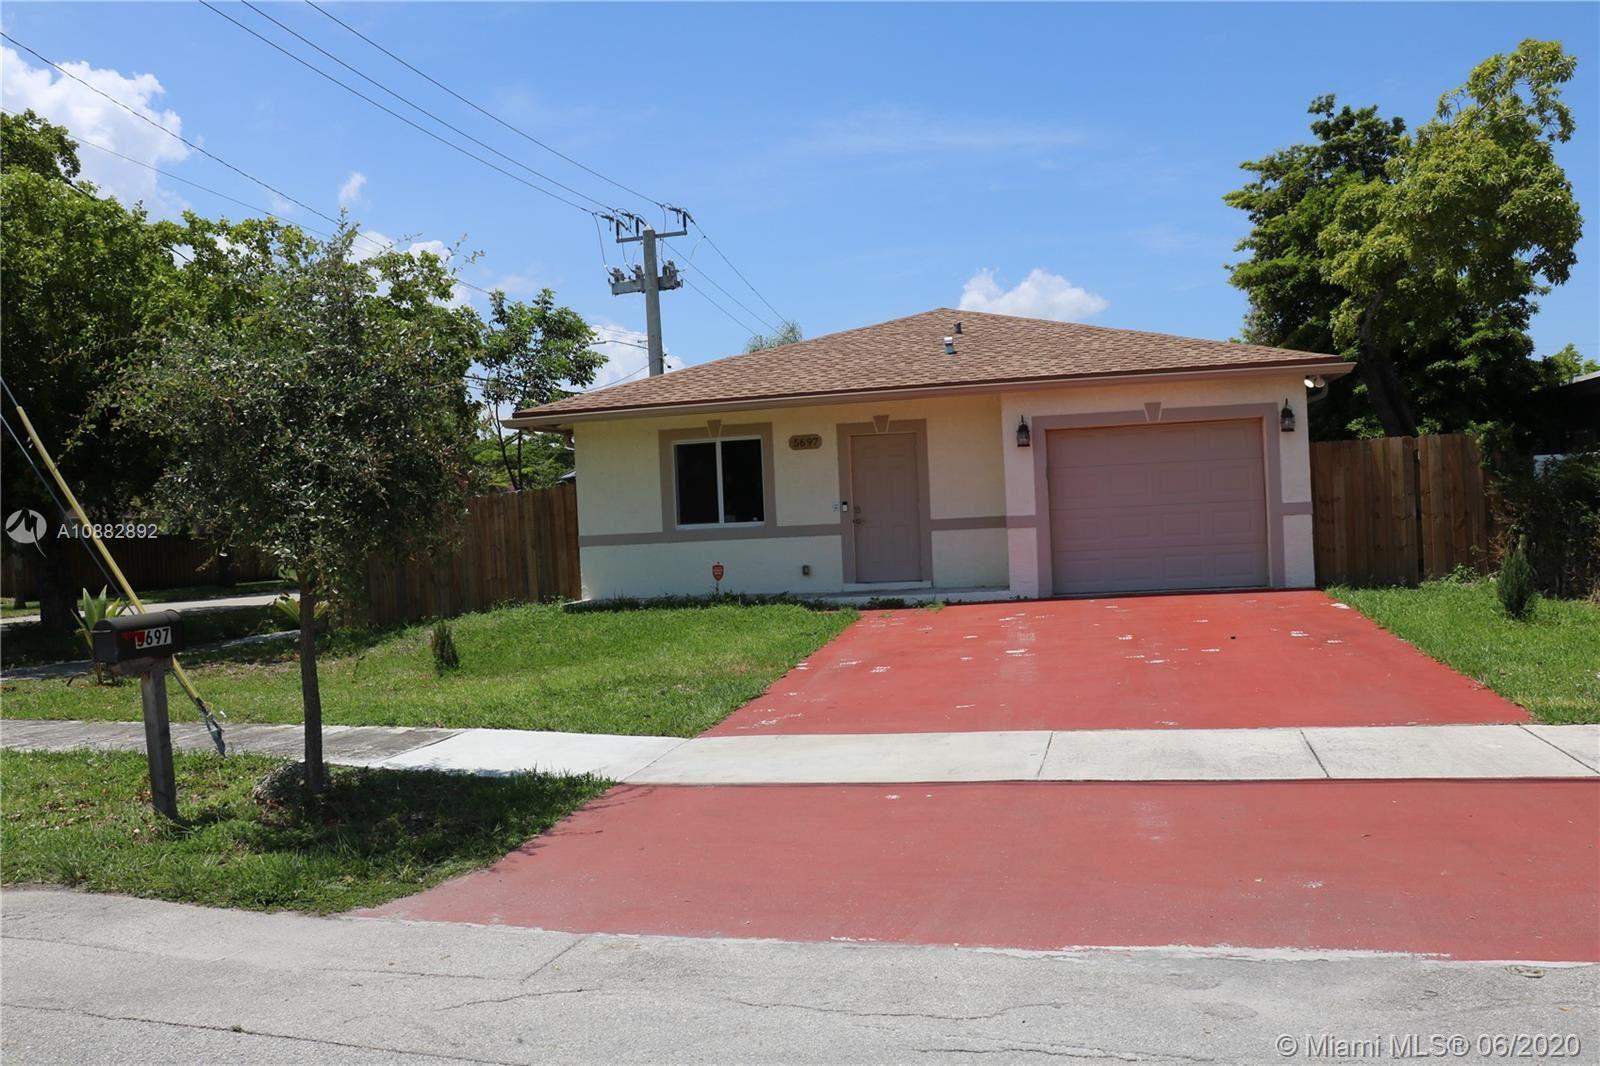 5697 Fletcher St, Hollywood, FL 33023 - #: A10882892